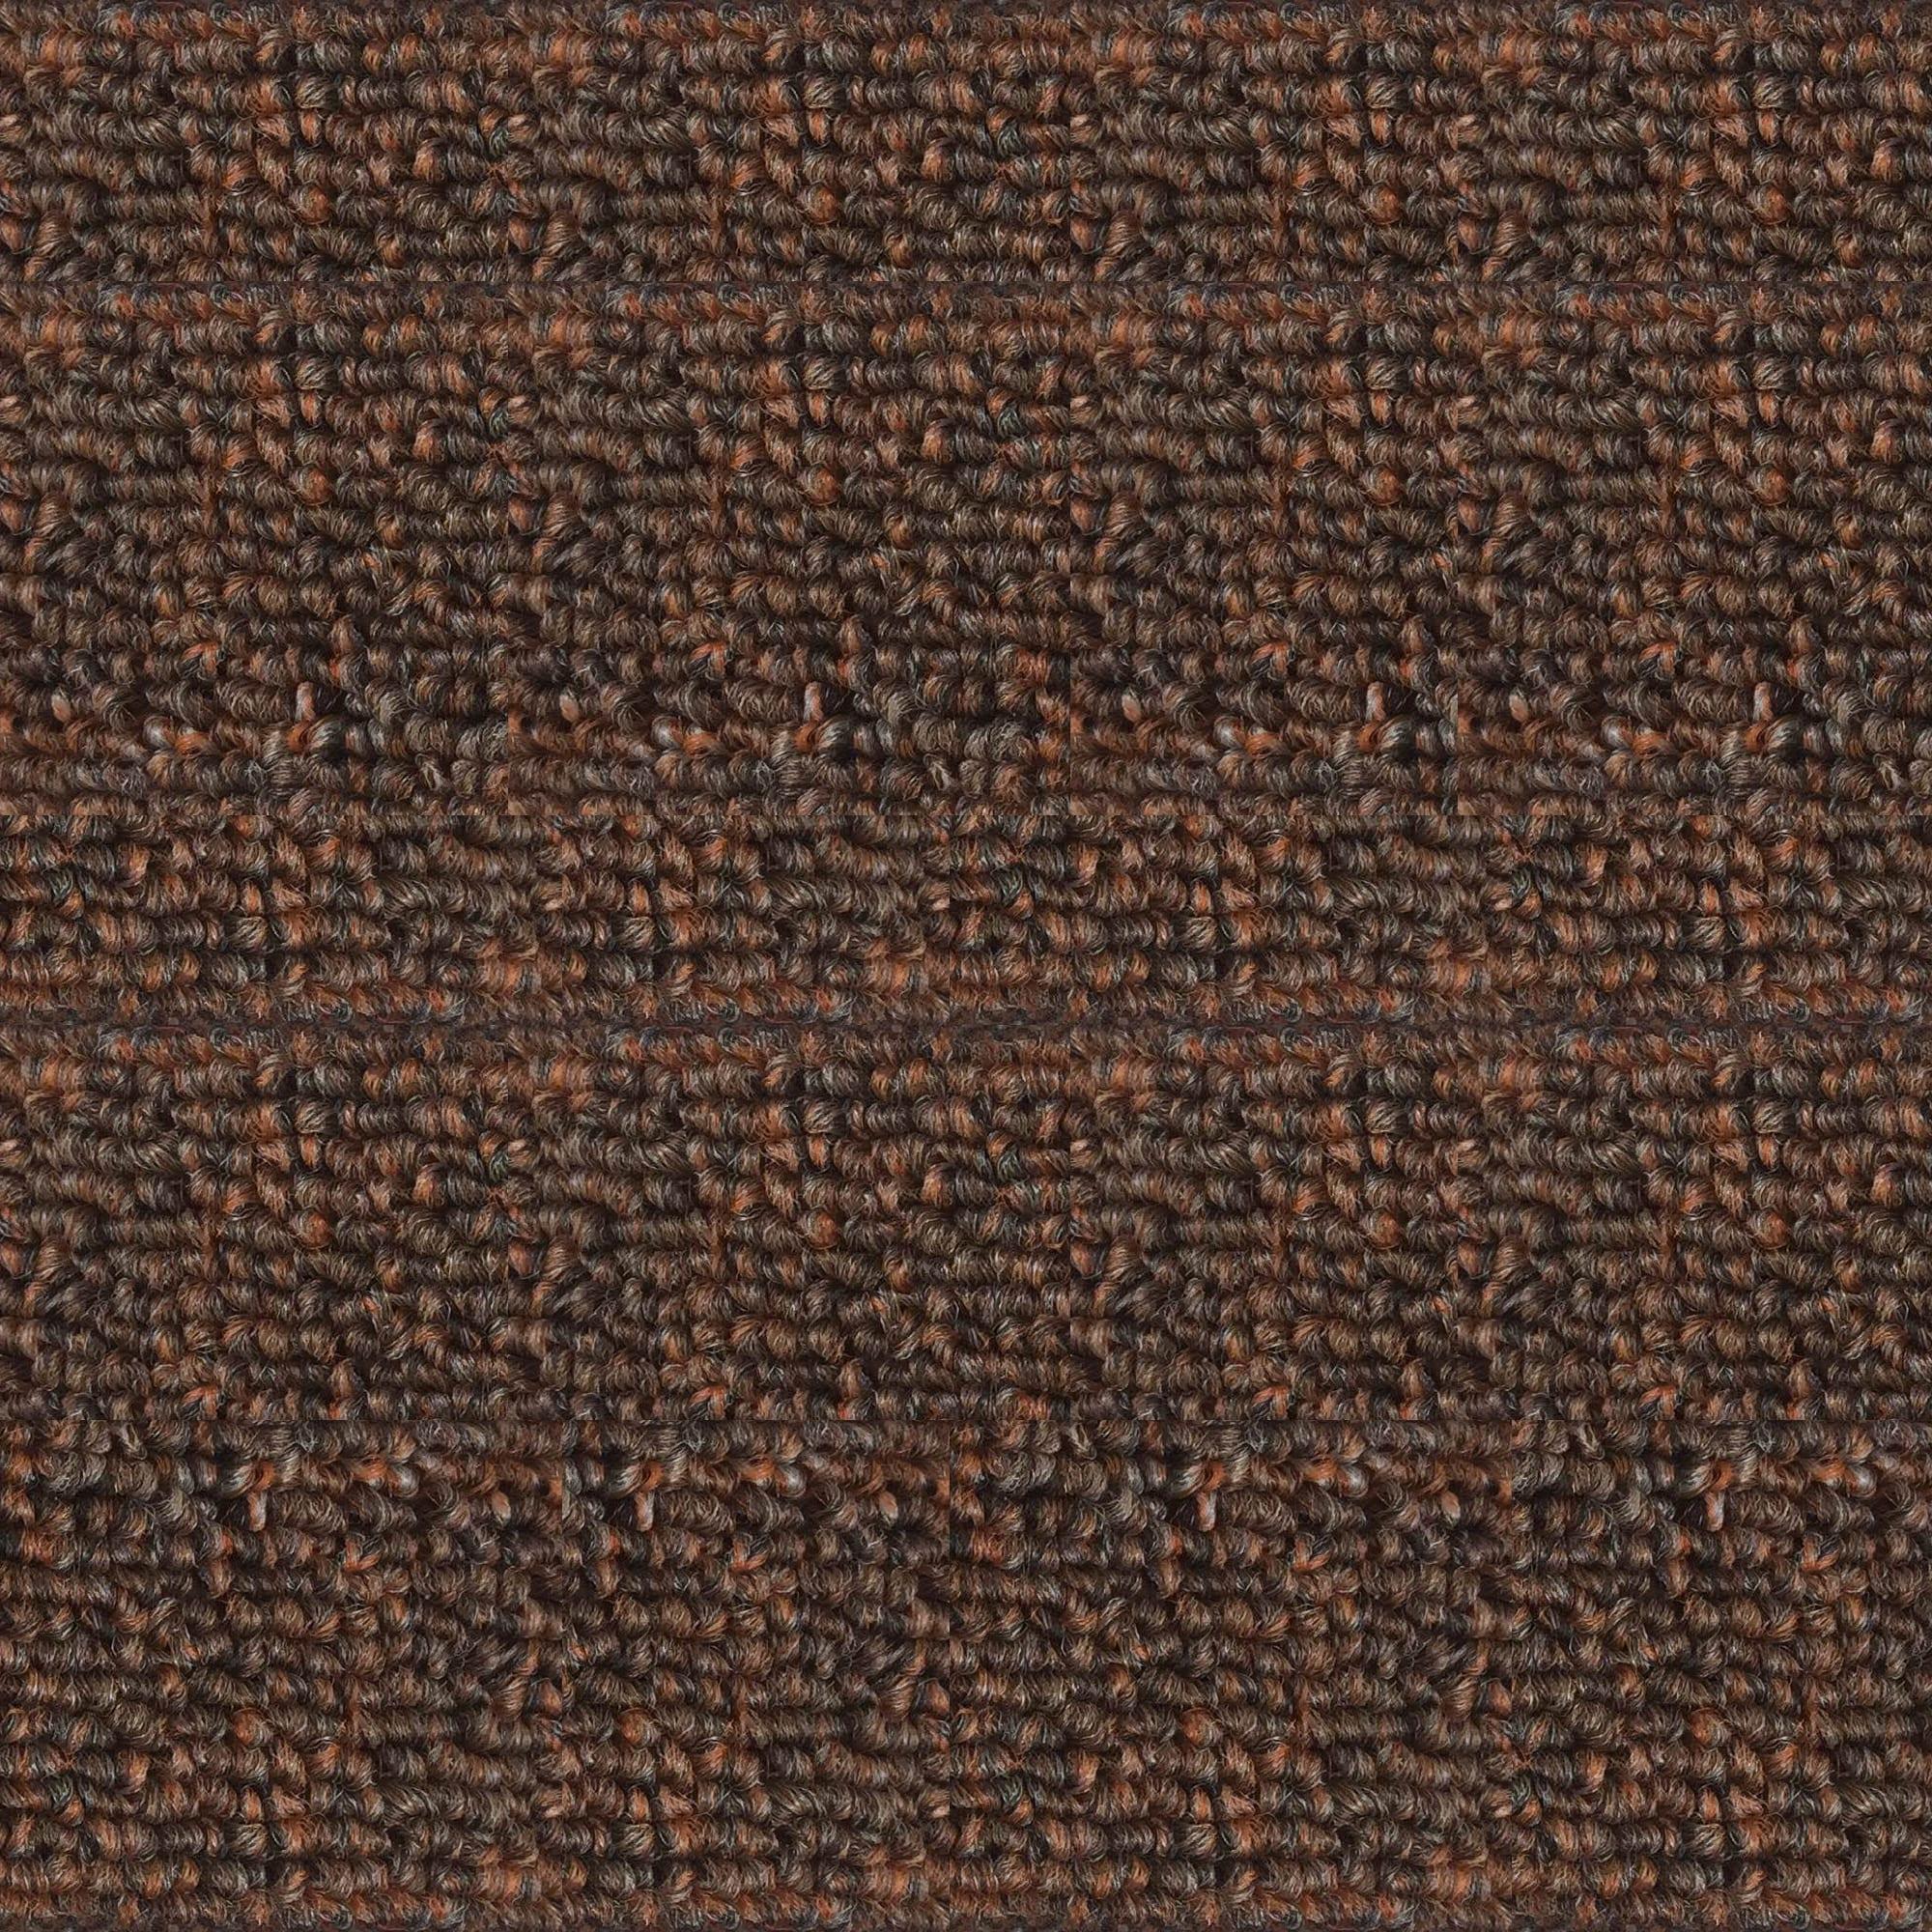 Lotus Leaf Carpet/Faux Fur - Brown